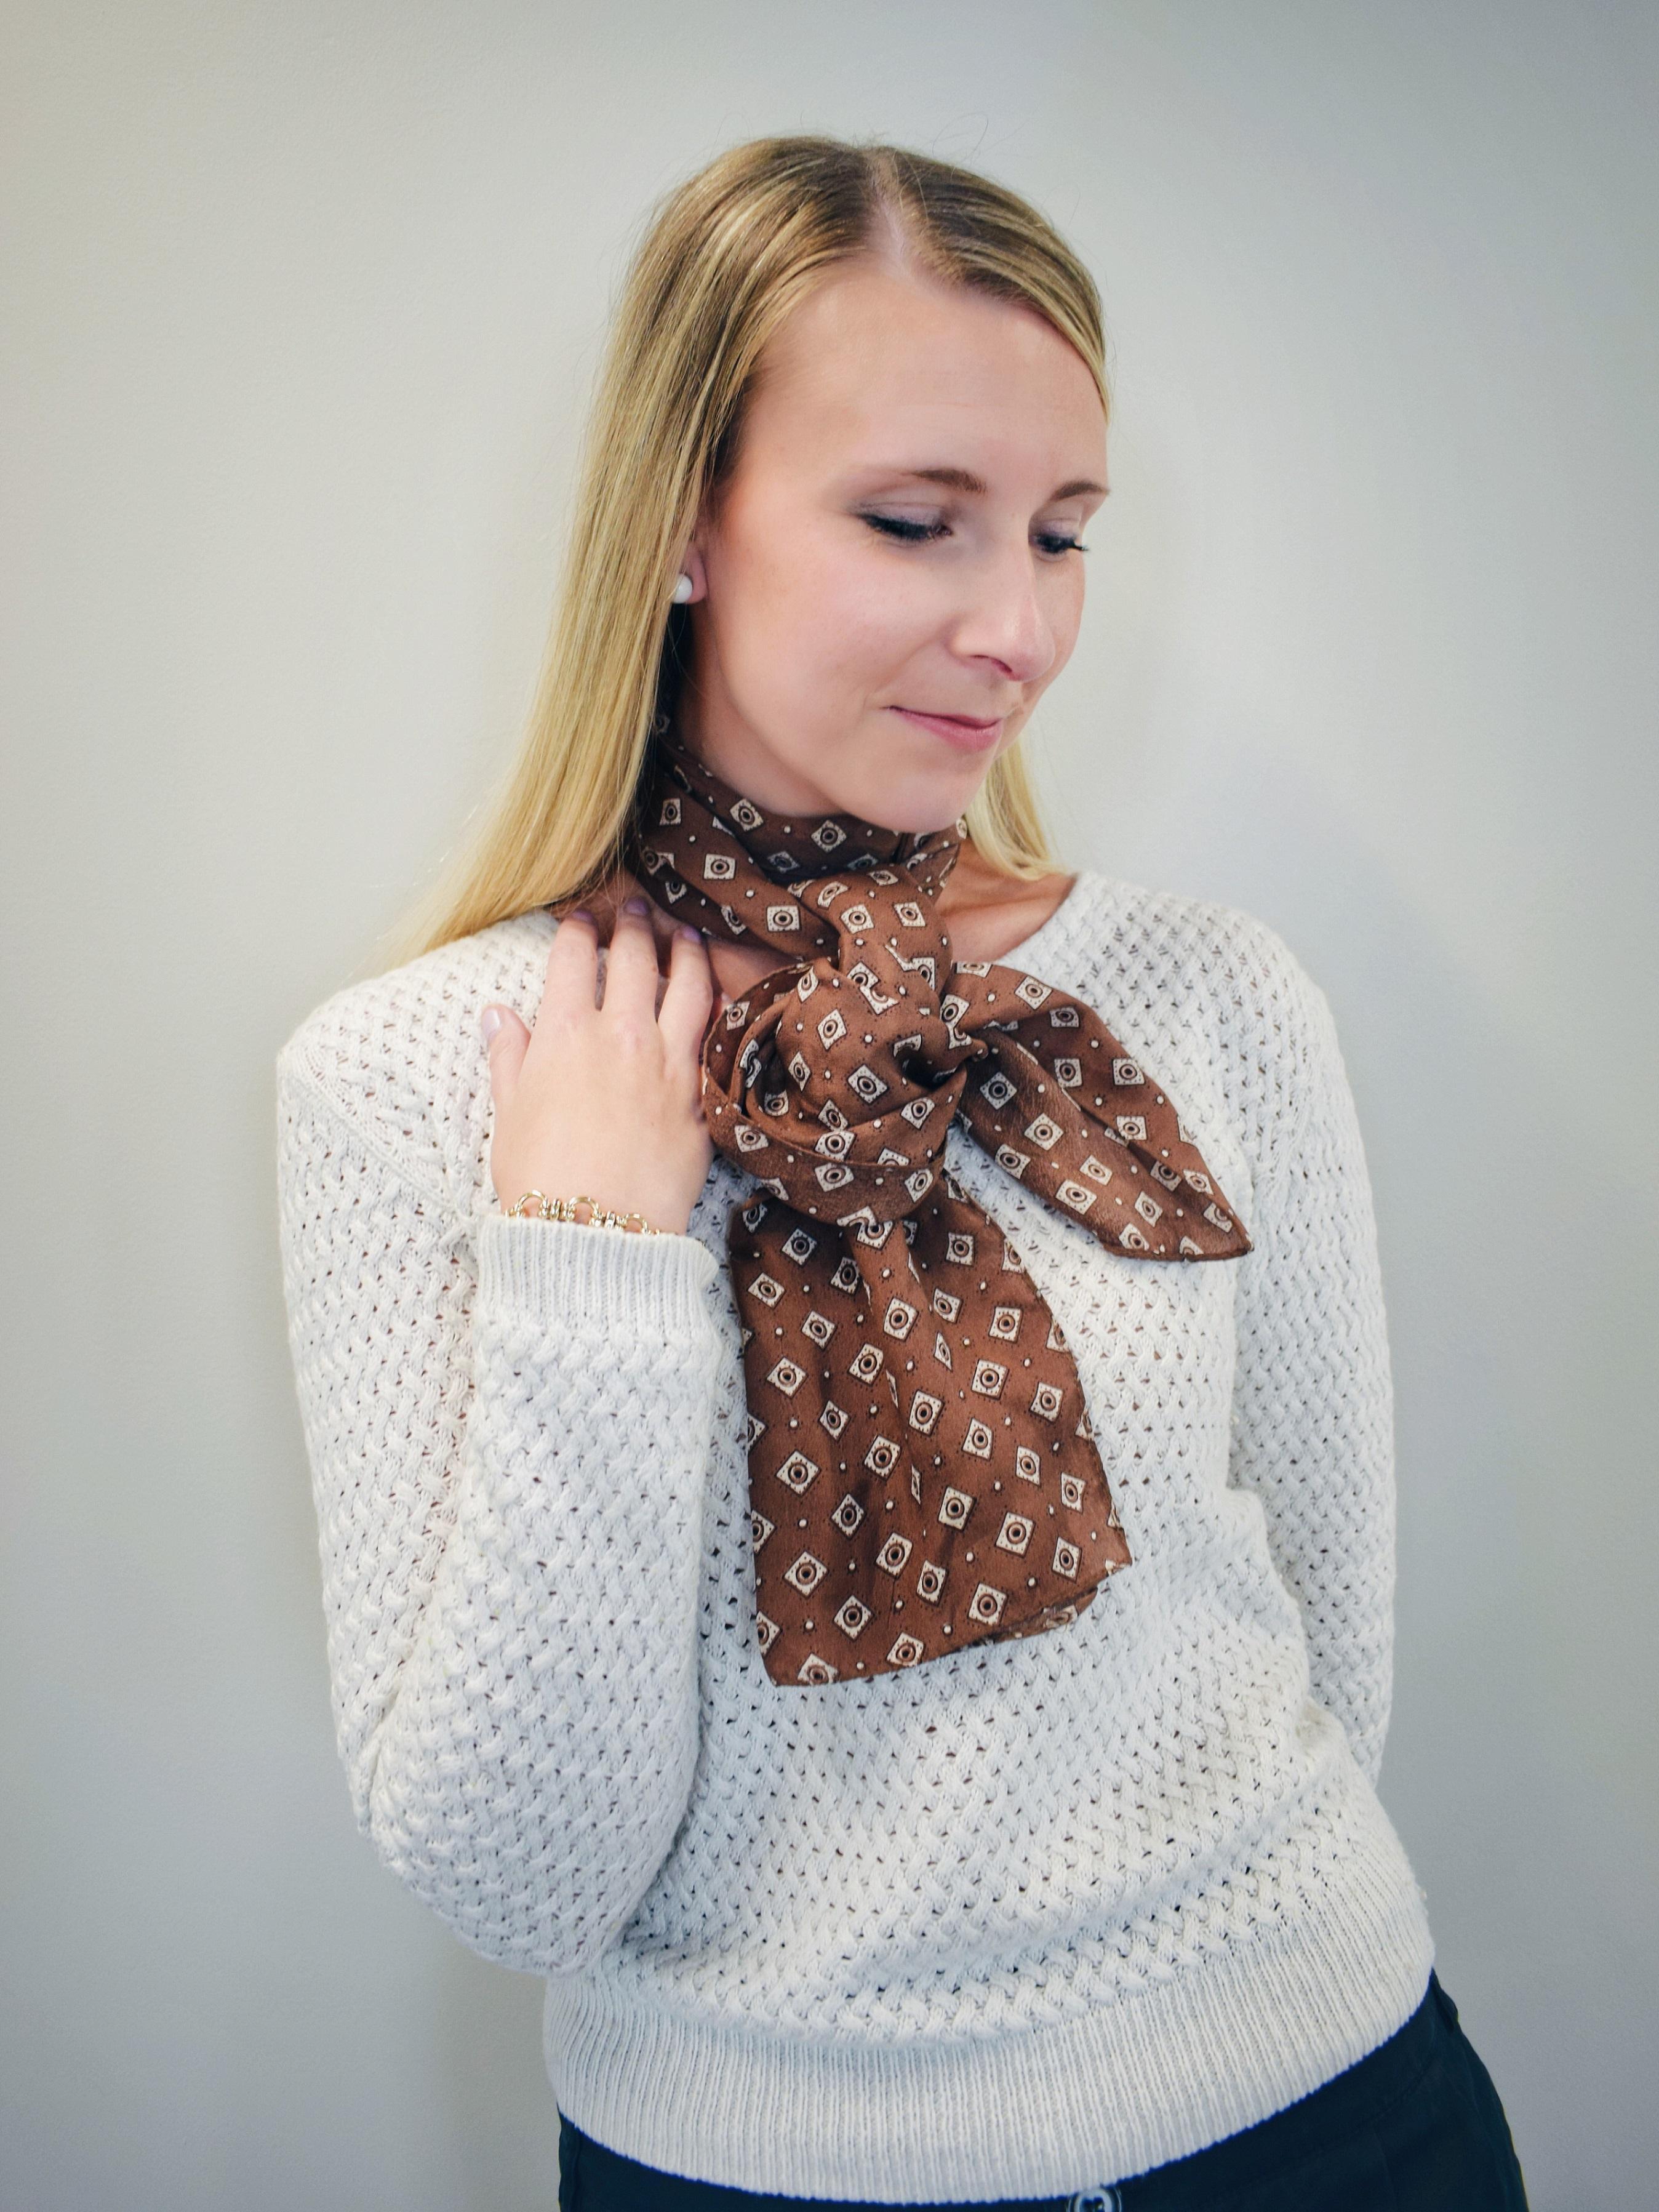 Outlandish blog style fashion trend silk scarf how to wear tutorial